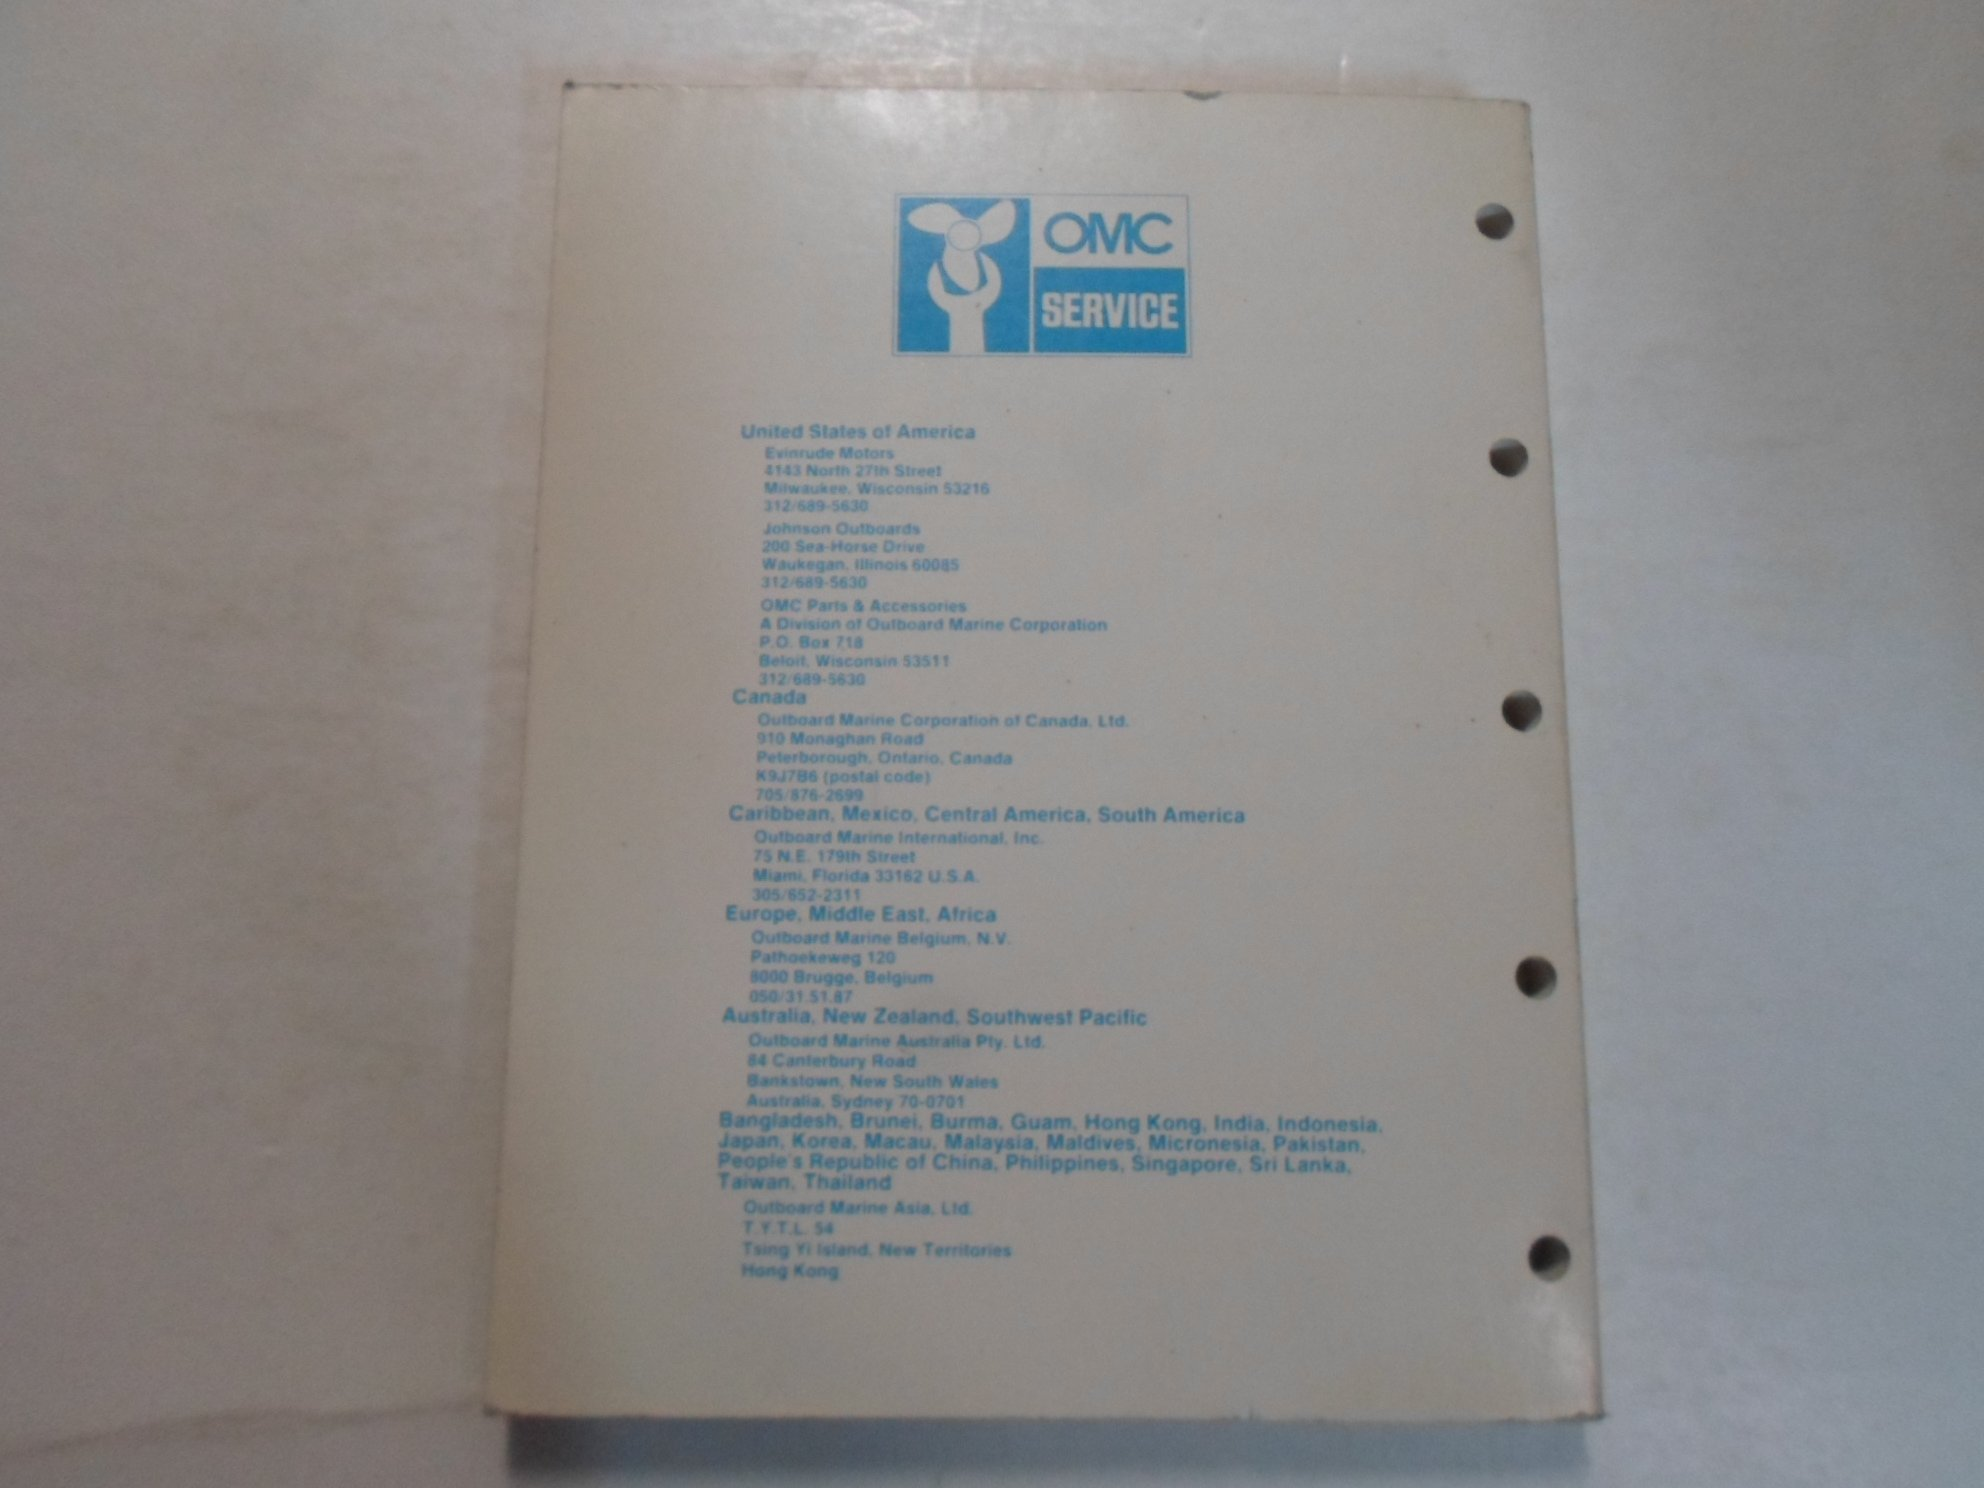 1985 Johnson Evinrude Co Cd Model V8 Service Repair Manual Minor Macau Electrical Wiring Code Wear Outboard Marine Corporation Books